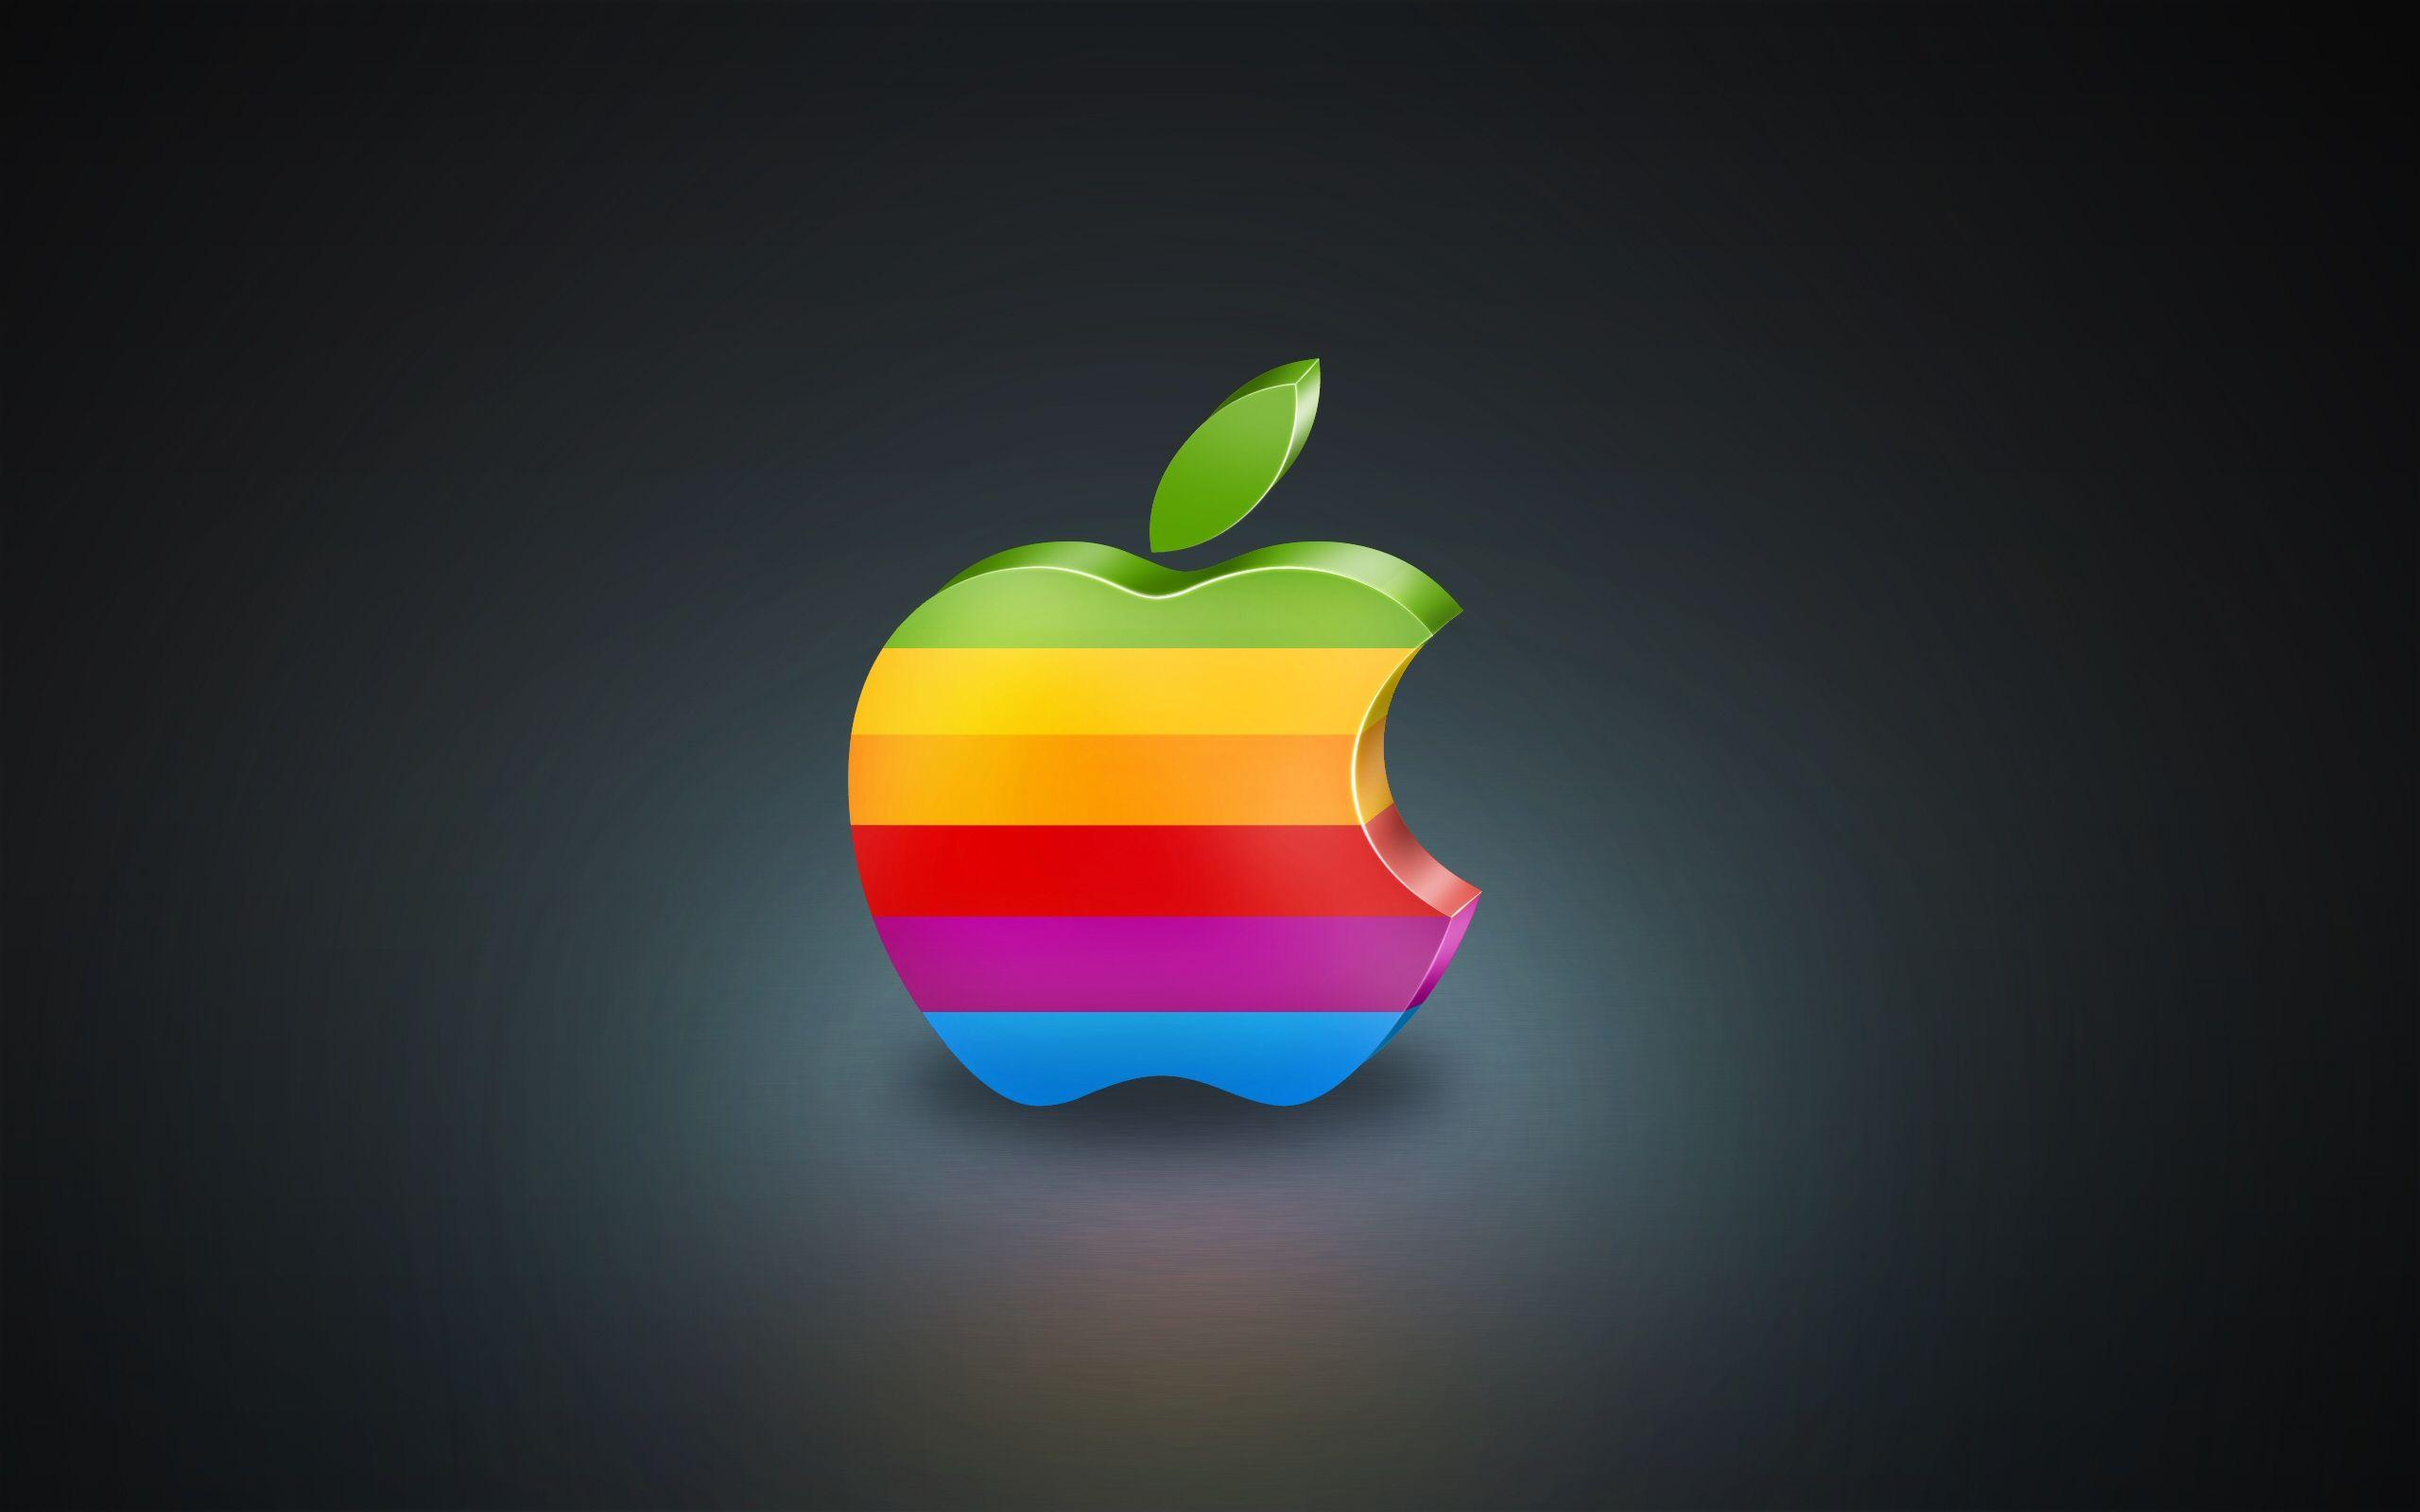 3d colorful apple wallpaper #3d, #apple, #colorful, #computers